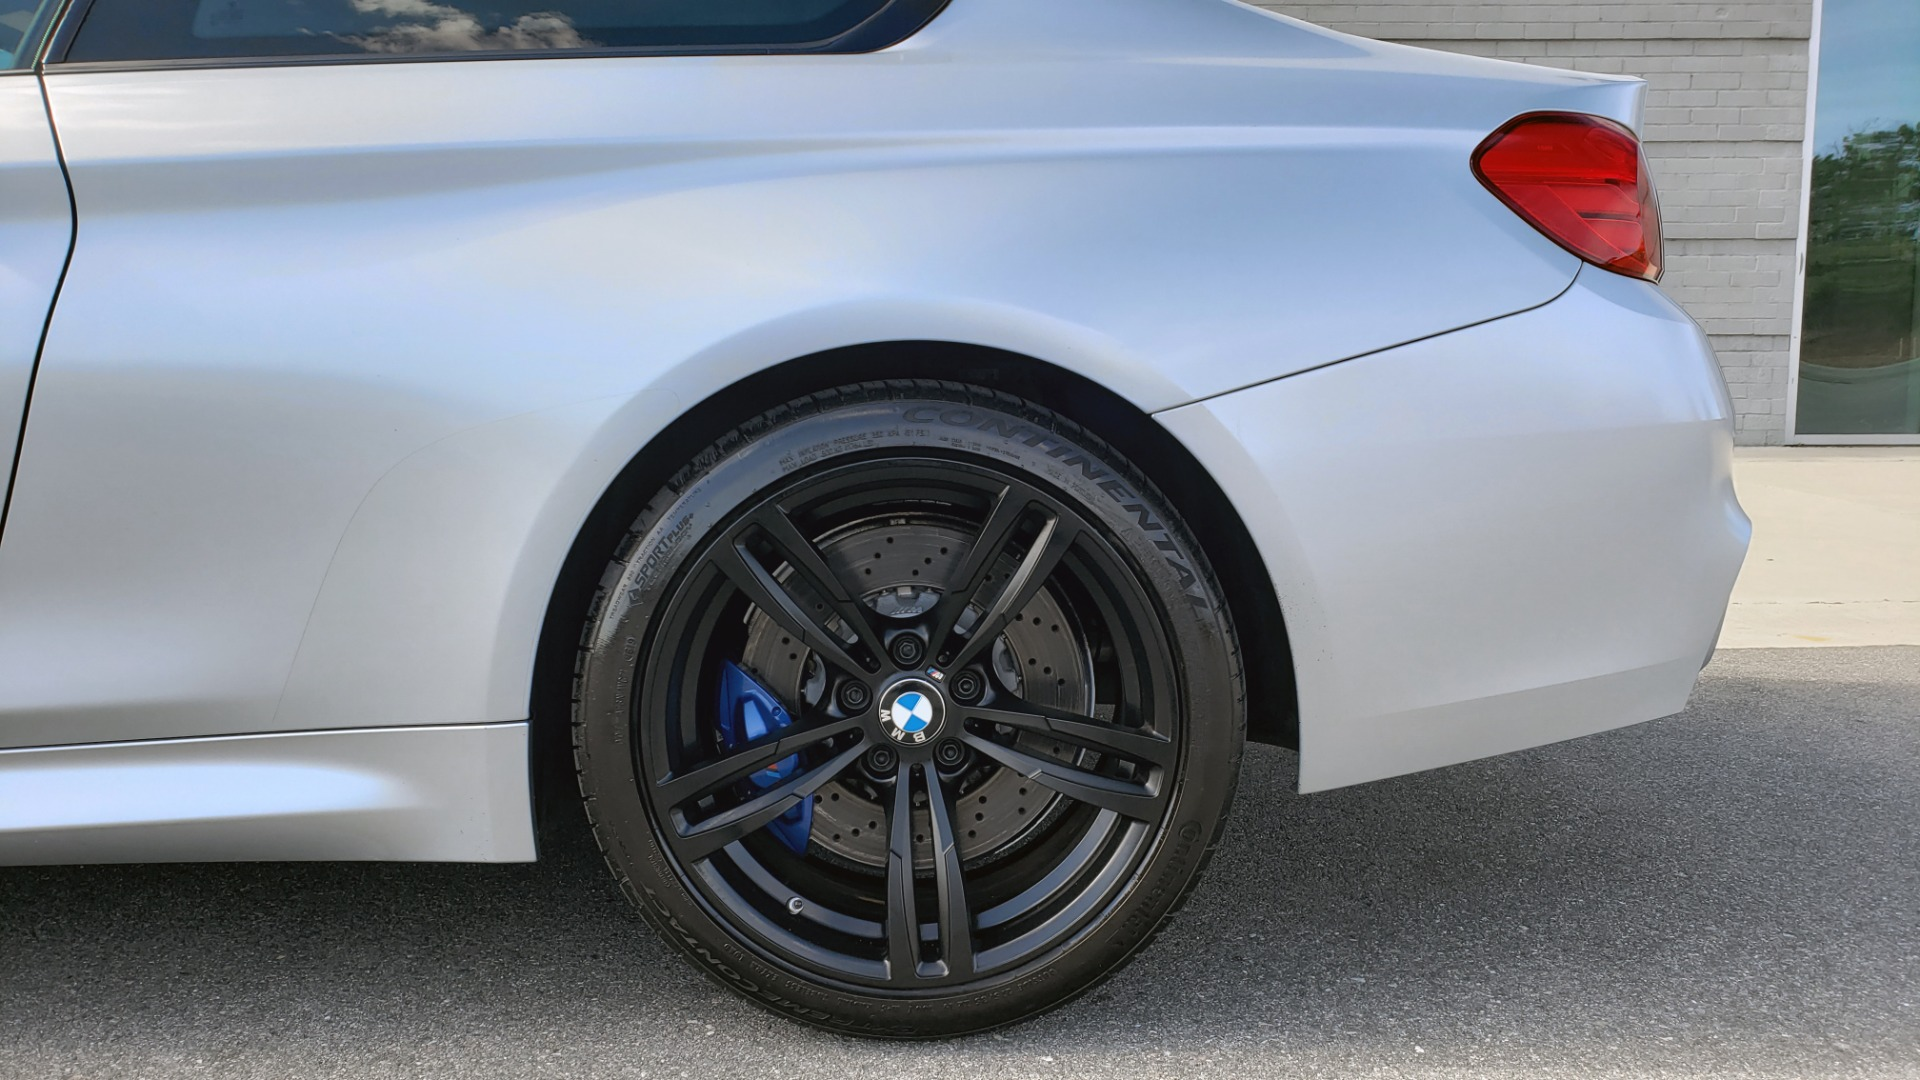 Used 2015 BMW M4 COUPE / EXEC PKG / DRVR ASST PLUS / LIGHTING / M-SUSPENSION for sale Sold at Formula Imports in Charlotte NC 28227 81